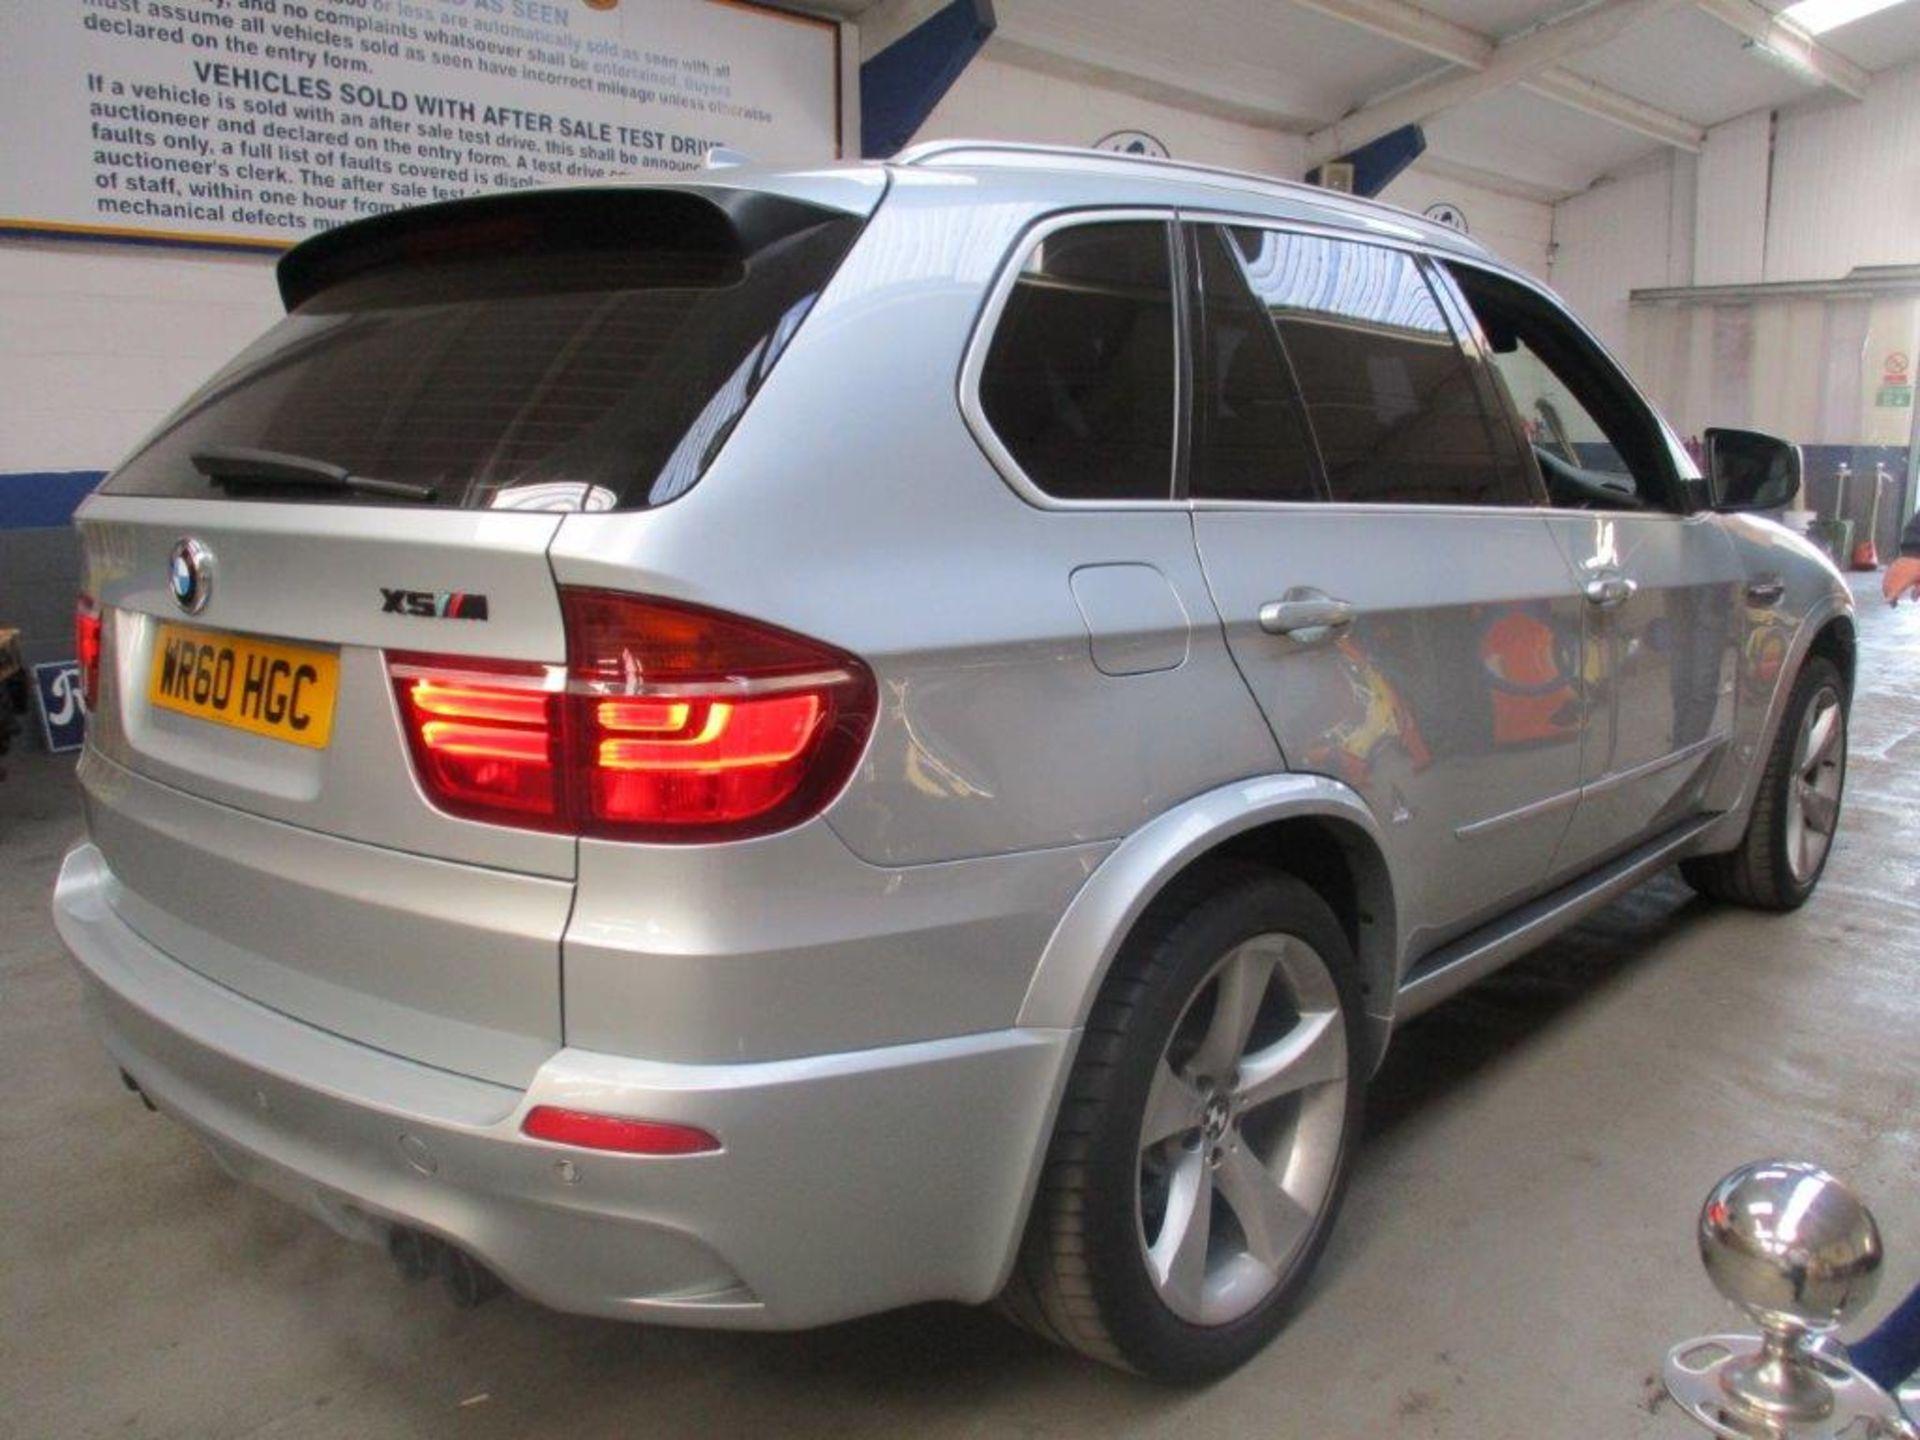 60 10 BMW X5 M Turbo Auto - Image 2 of 35